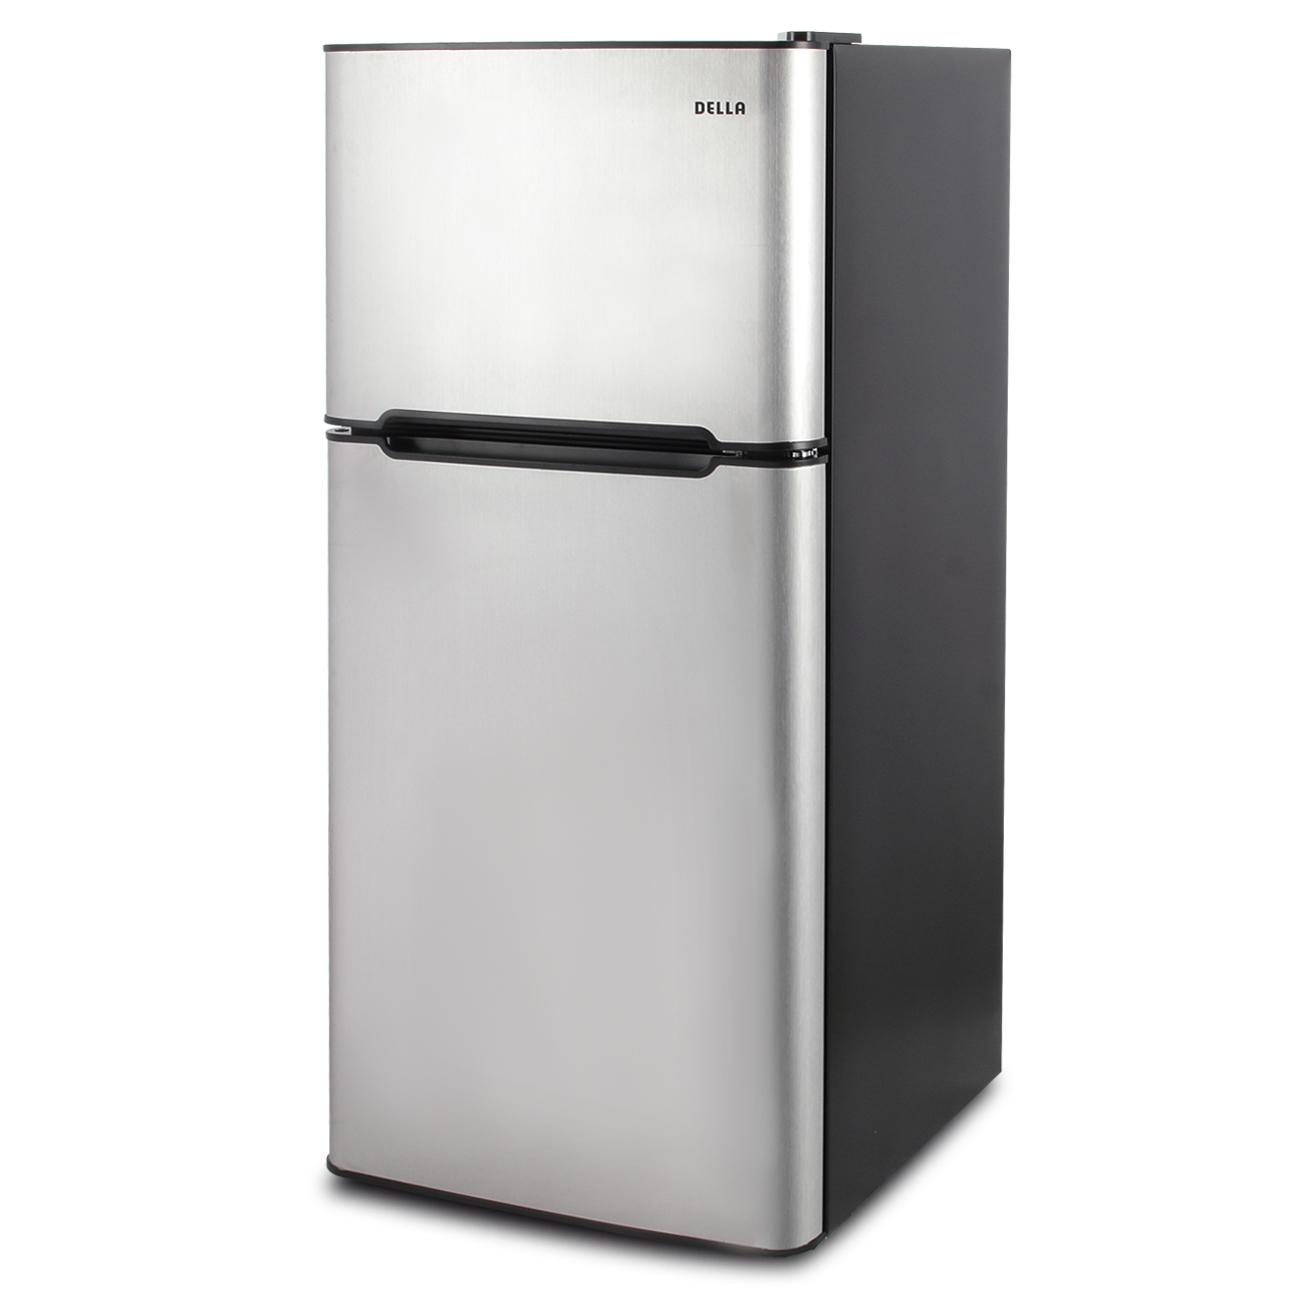 Genial 4.5 Cu. Ft. Mini Fridge Compact Refrigerator Freezer Dorm Studio Stainless  Steel